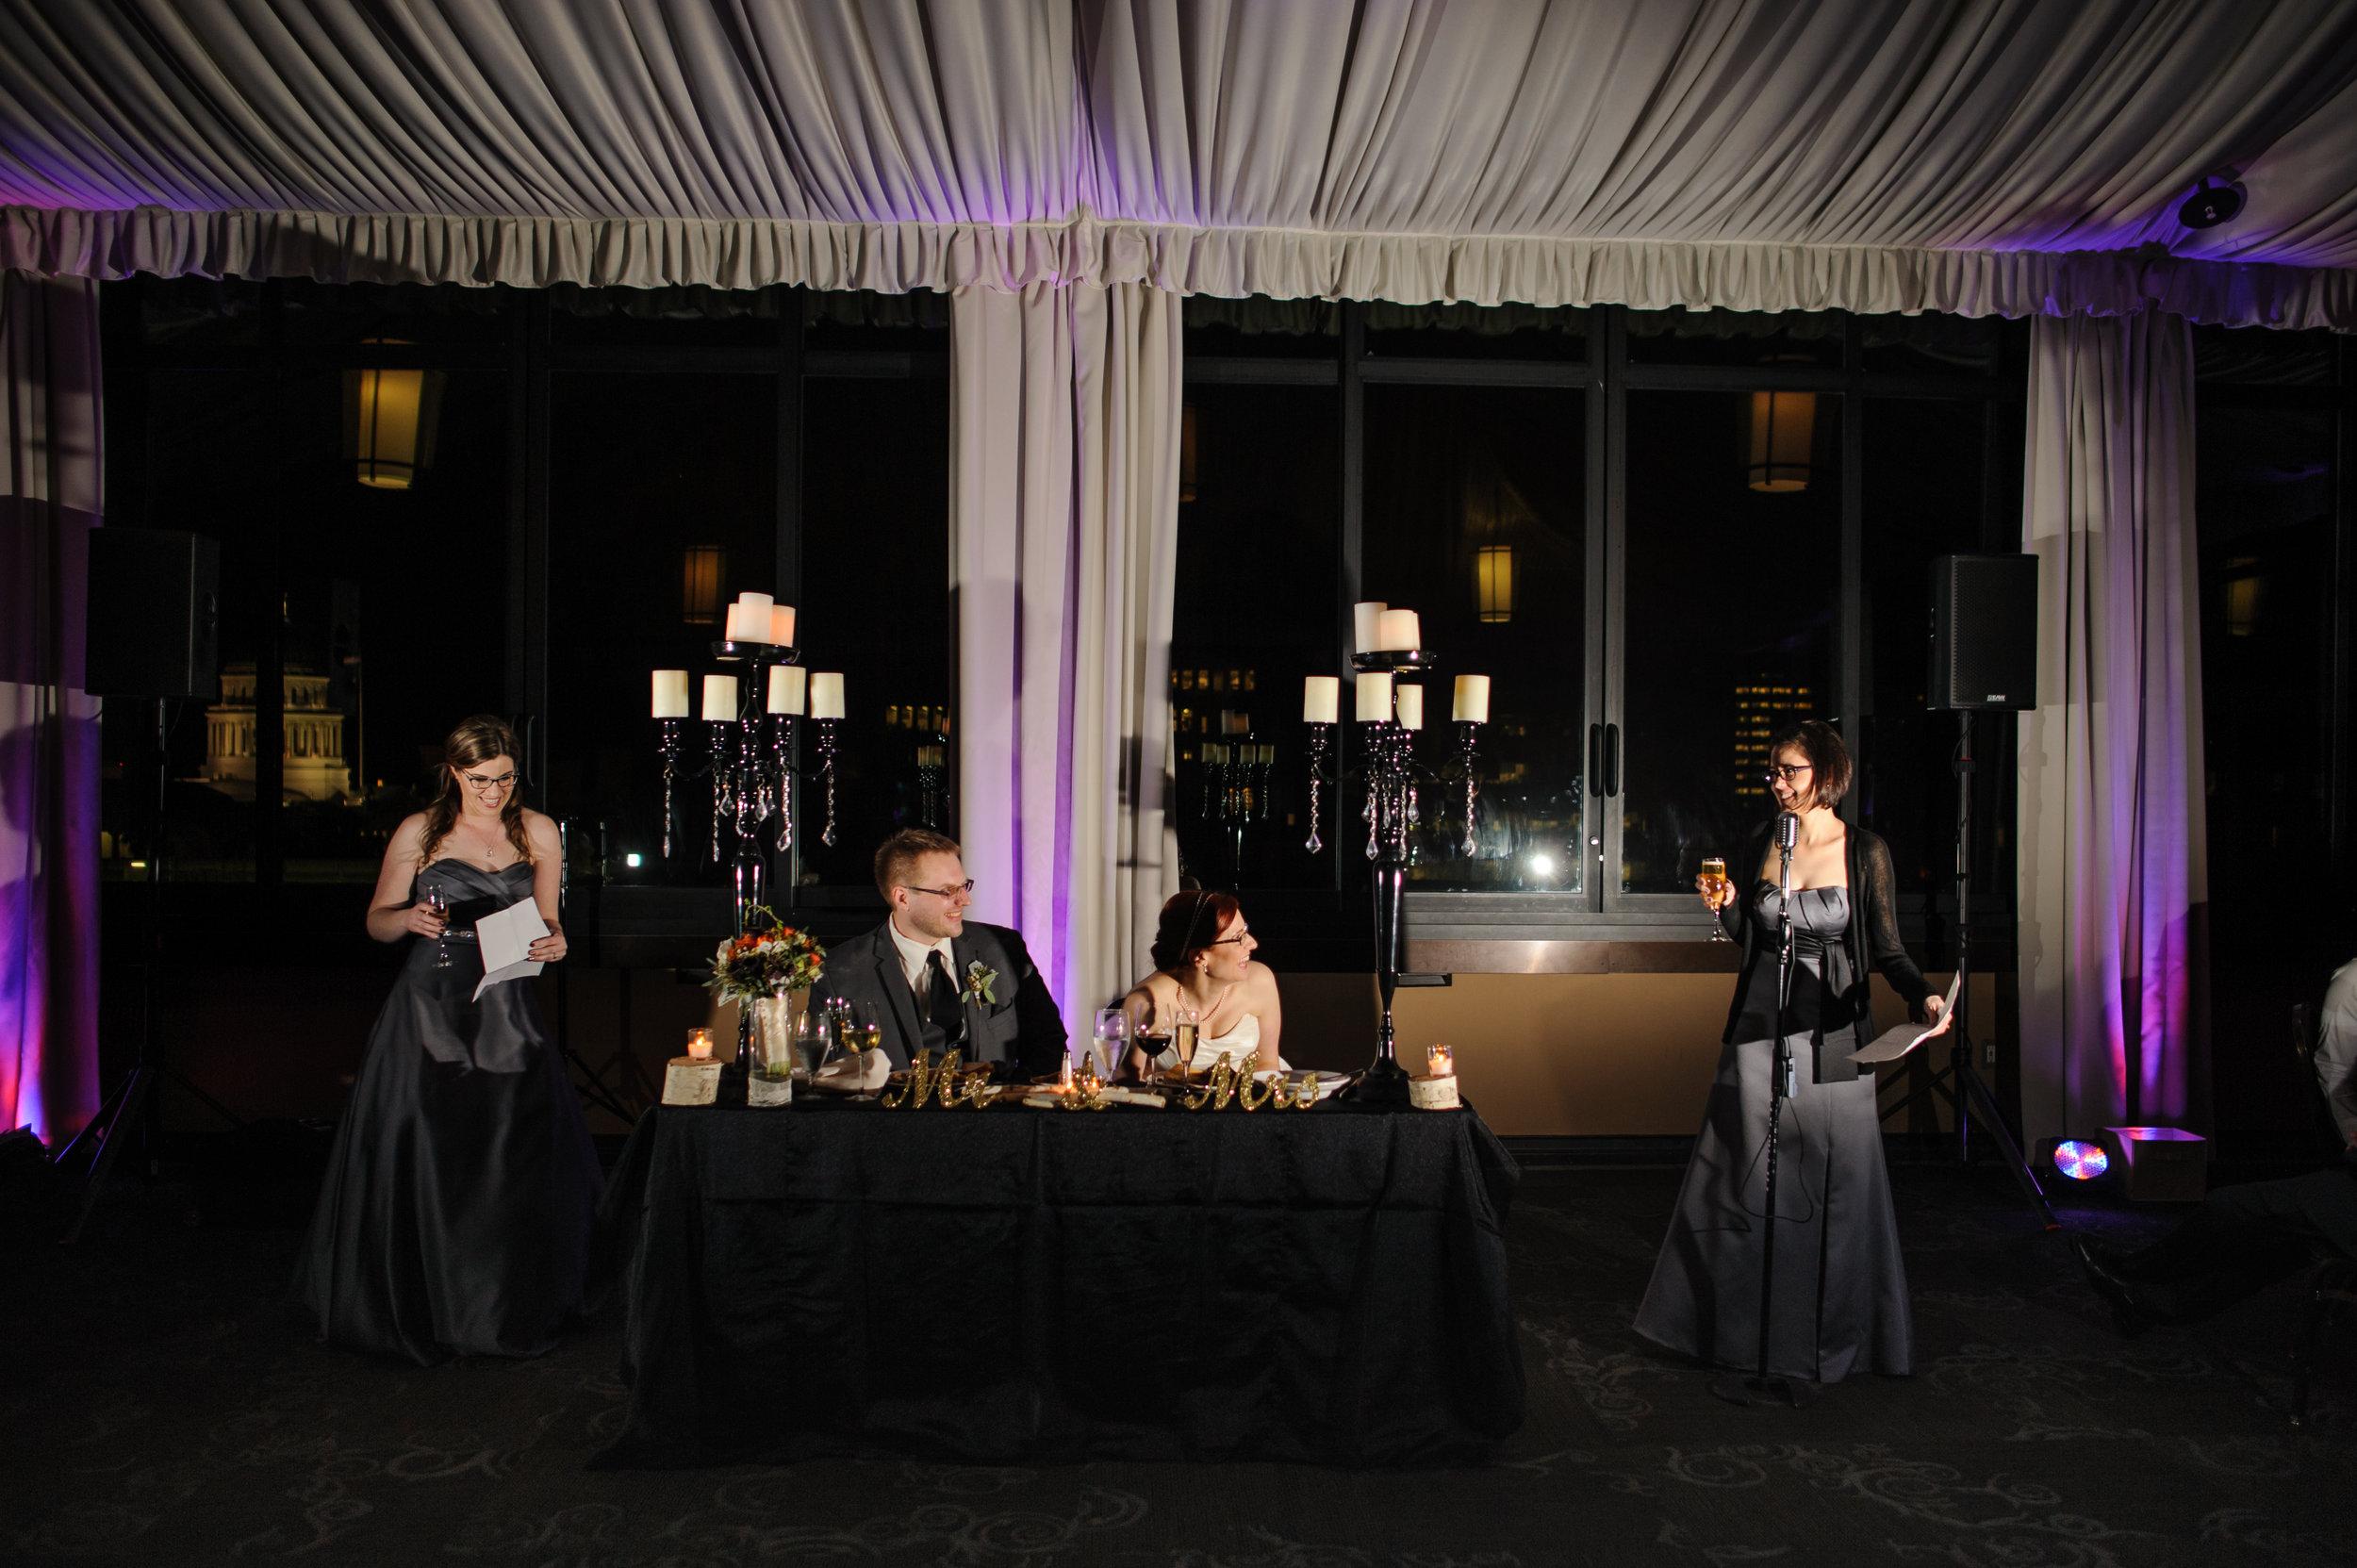 judith-john-004-citizen-hotel-sacramento-wedding-photographer-katherine-nicole-photography.JPG